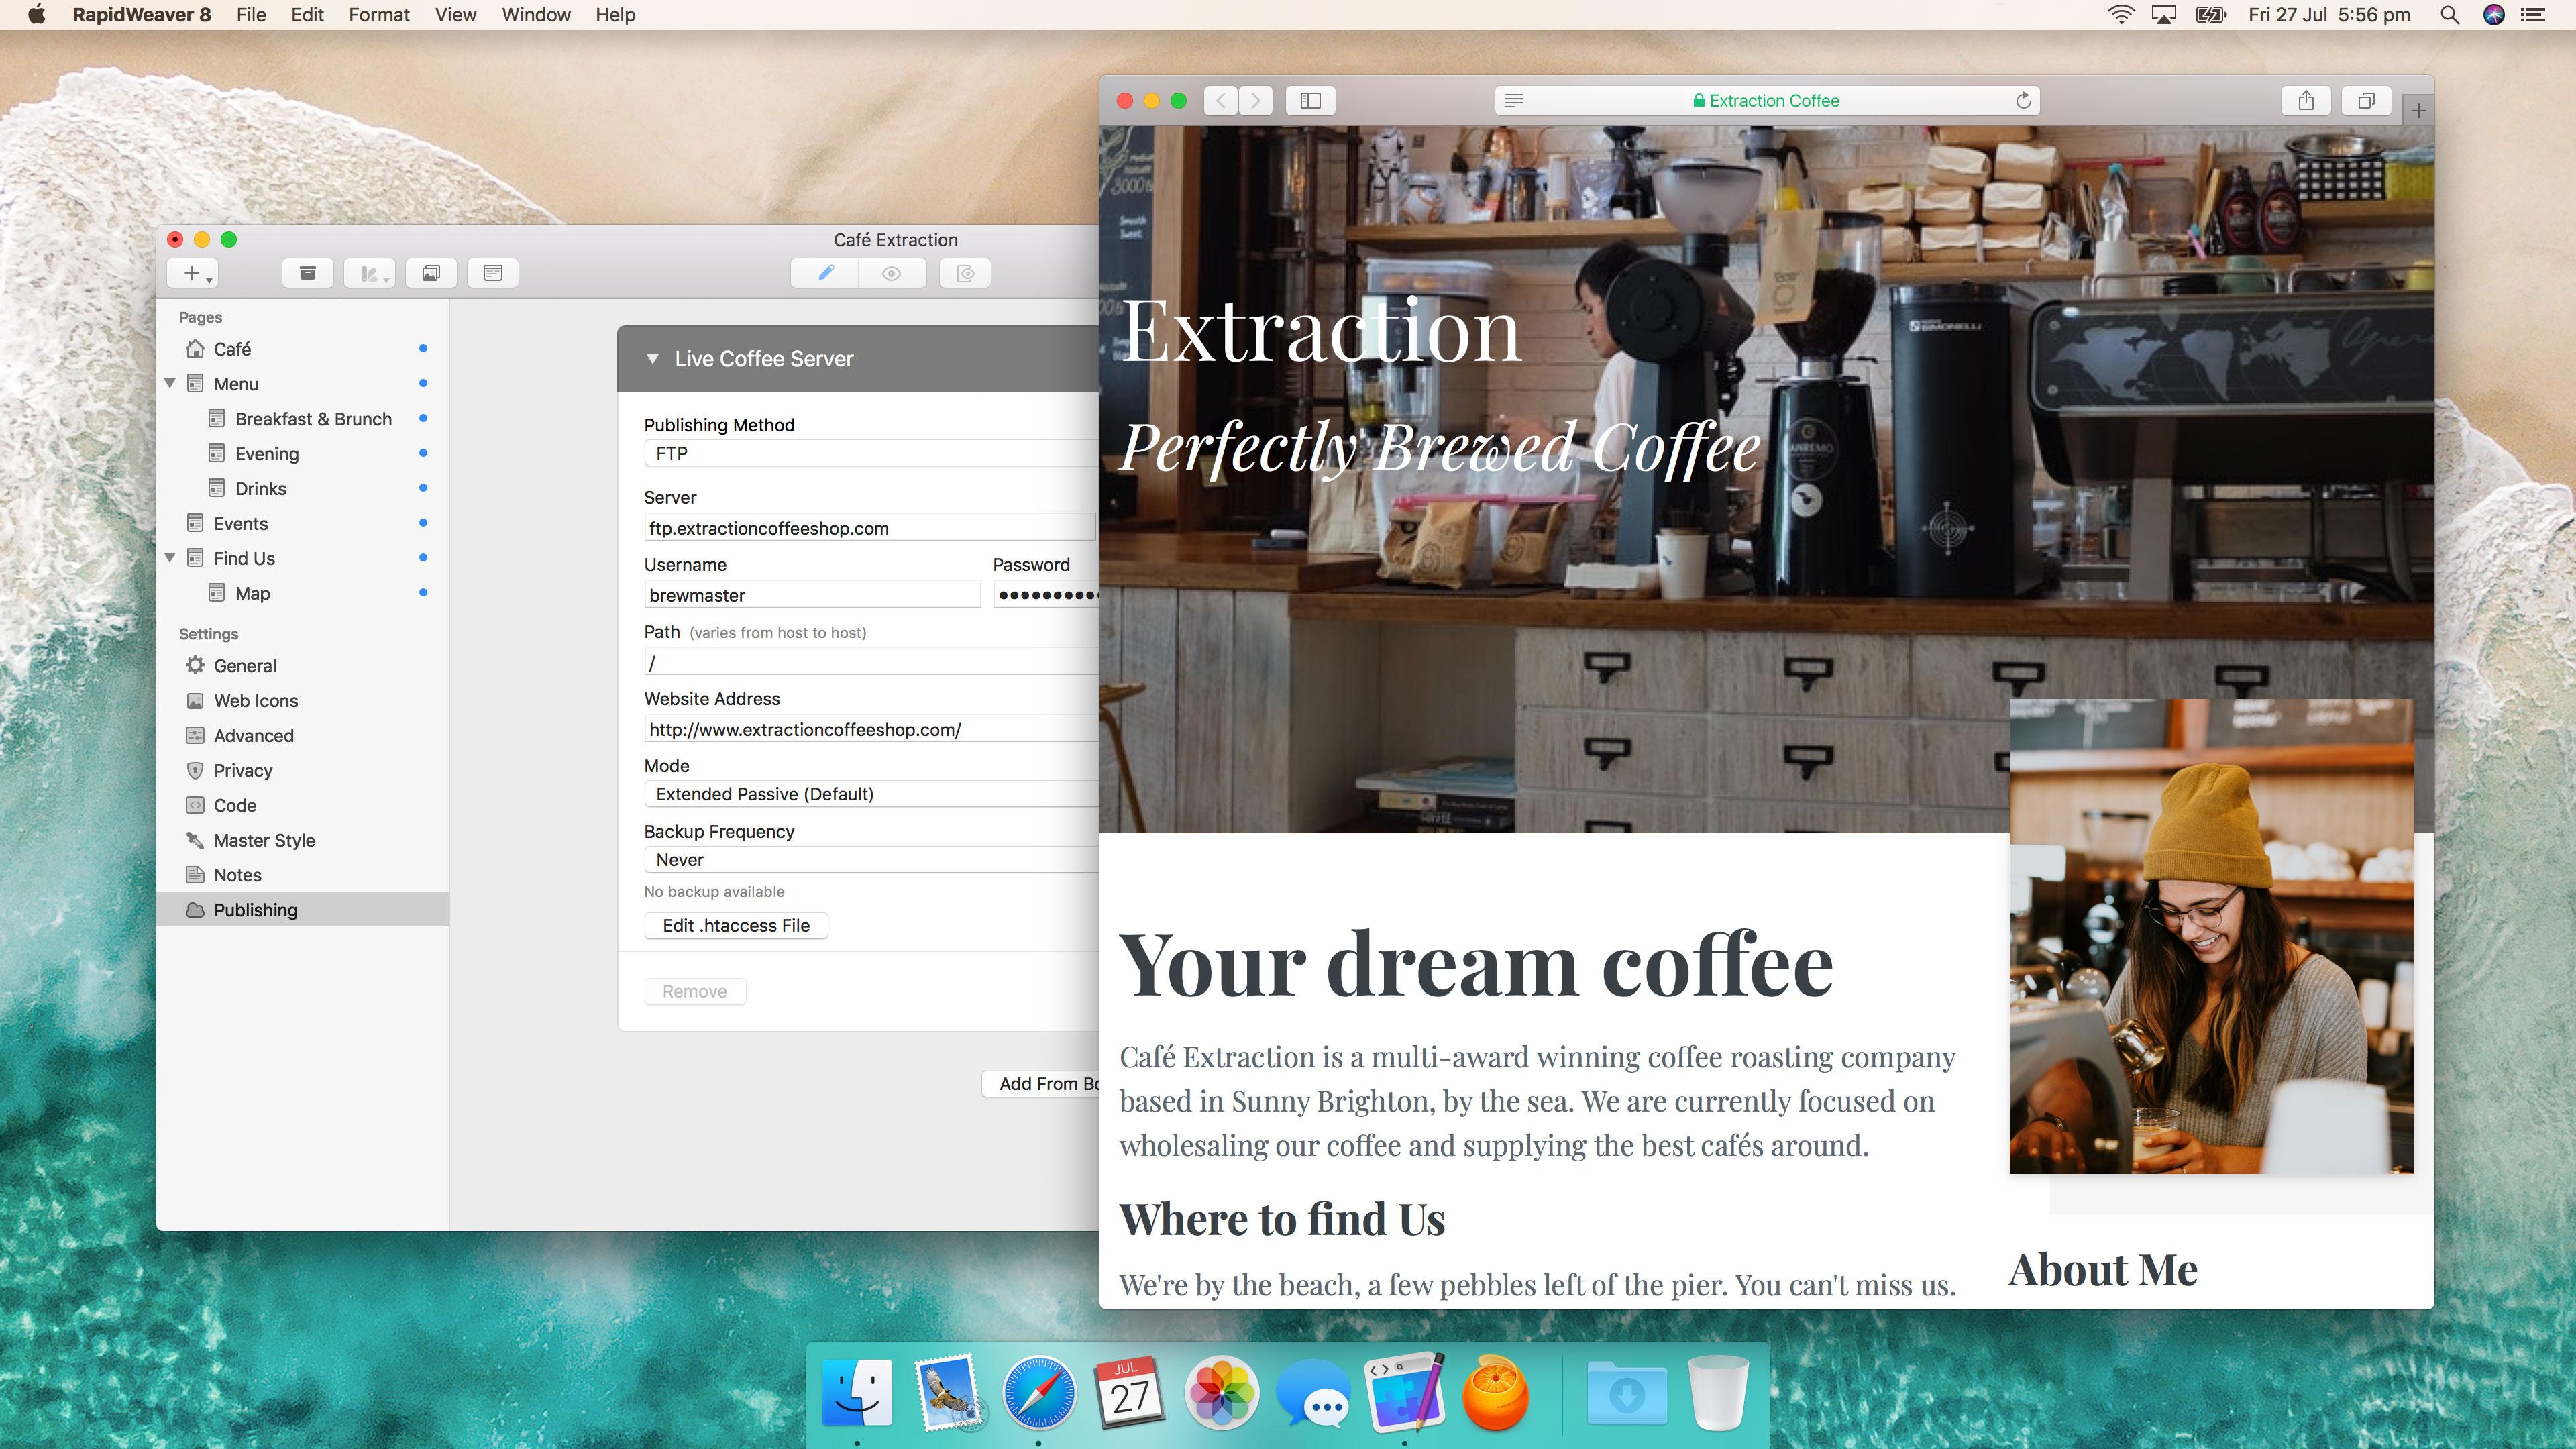 RapidWeaver 8.9.1.20881 Mac 破解版 优秀的零编码网页开发工具